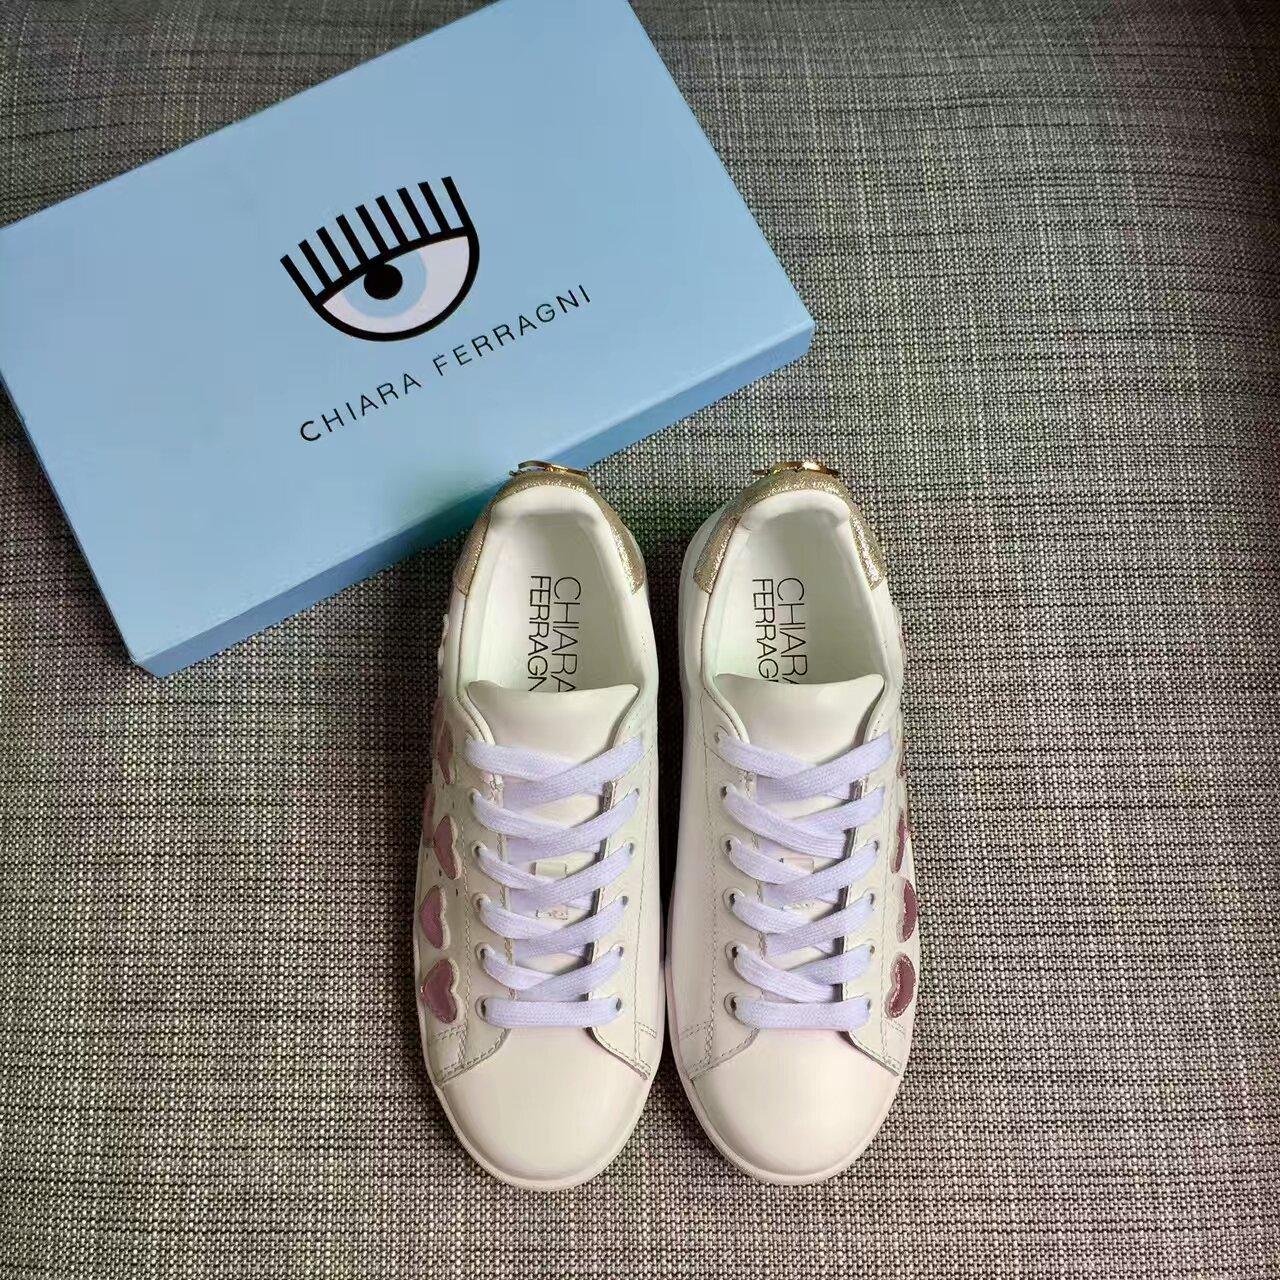 Chiaraferragni休闲鞋 超级潮品 各大时尚博主必备单品